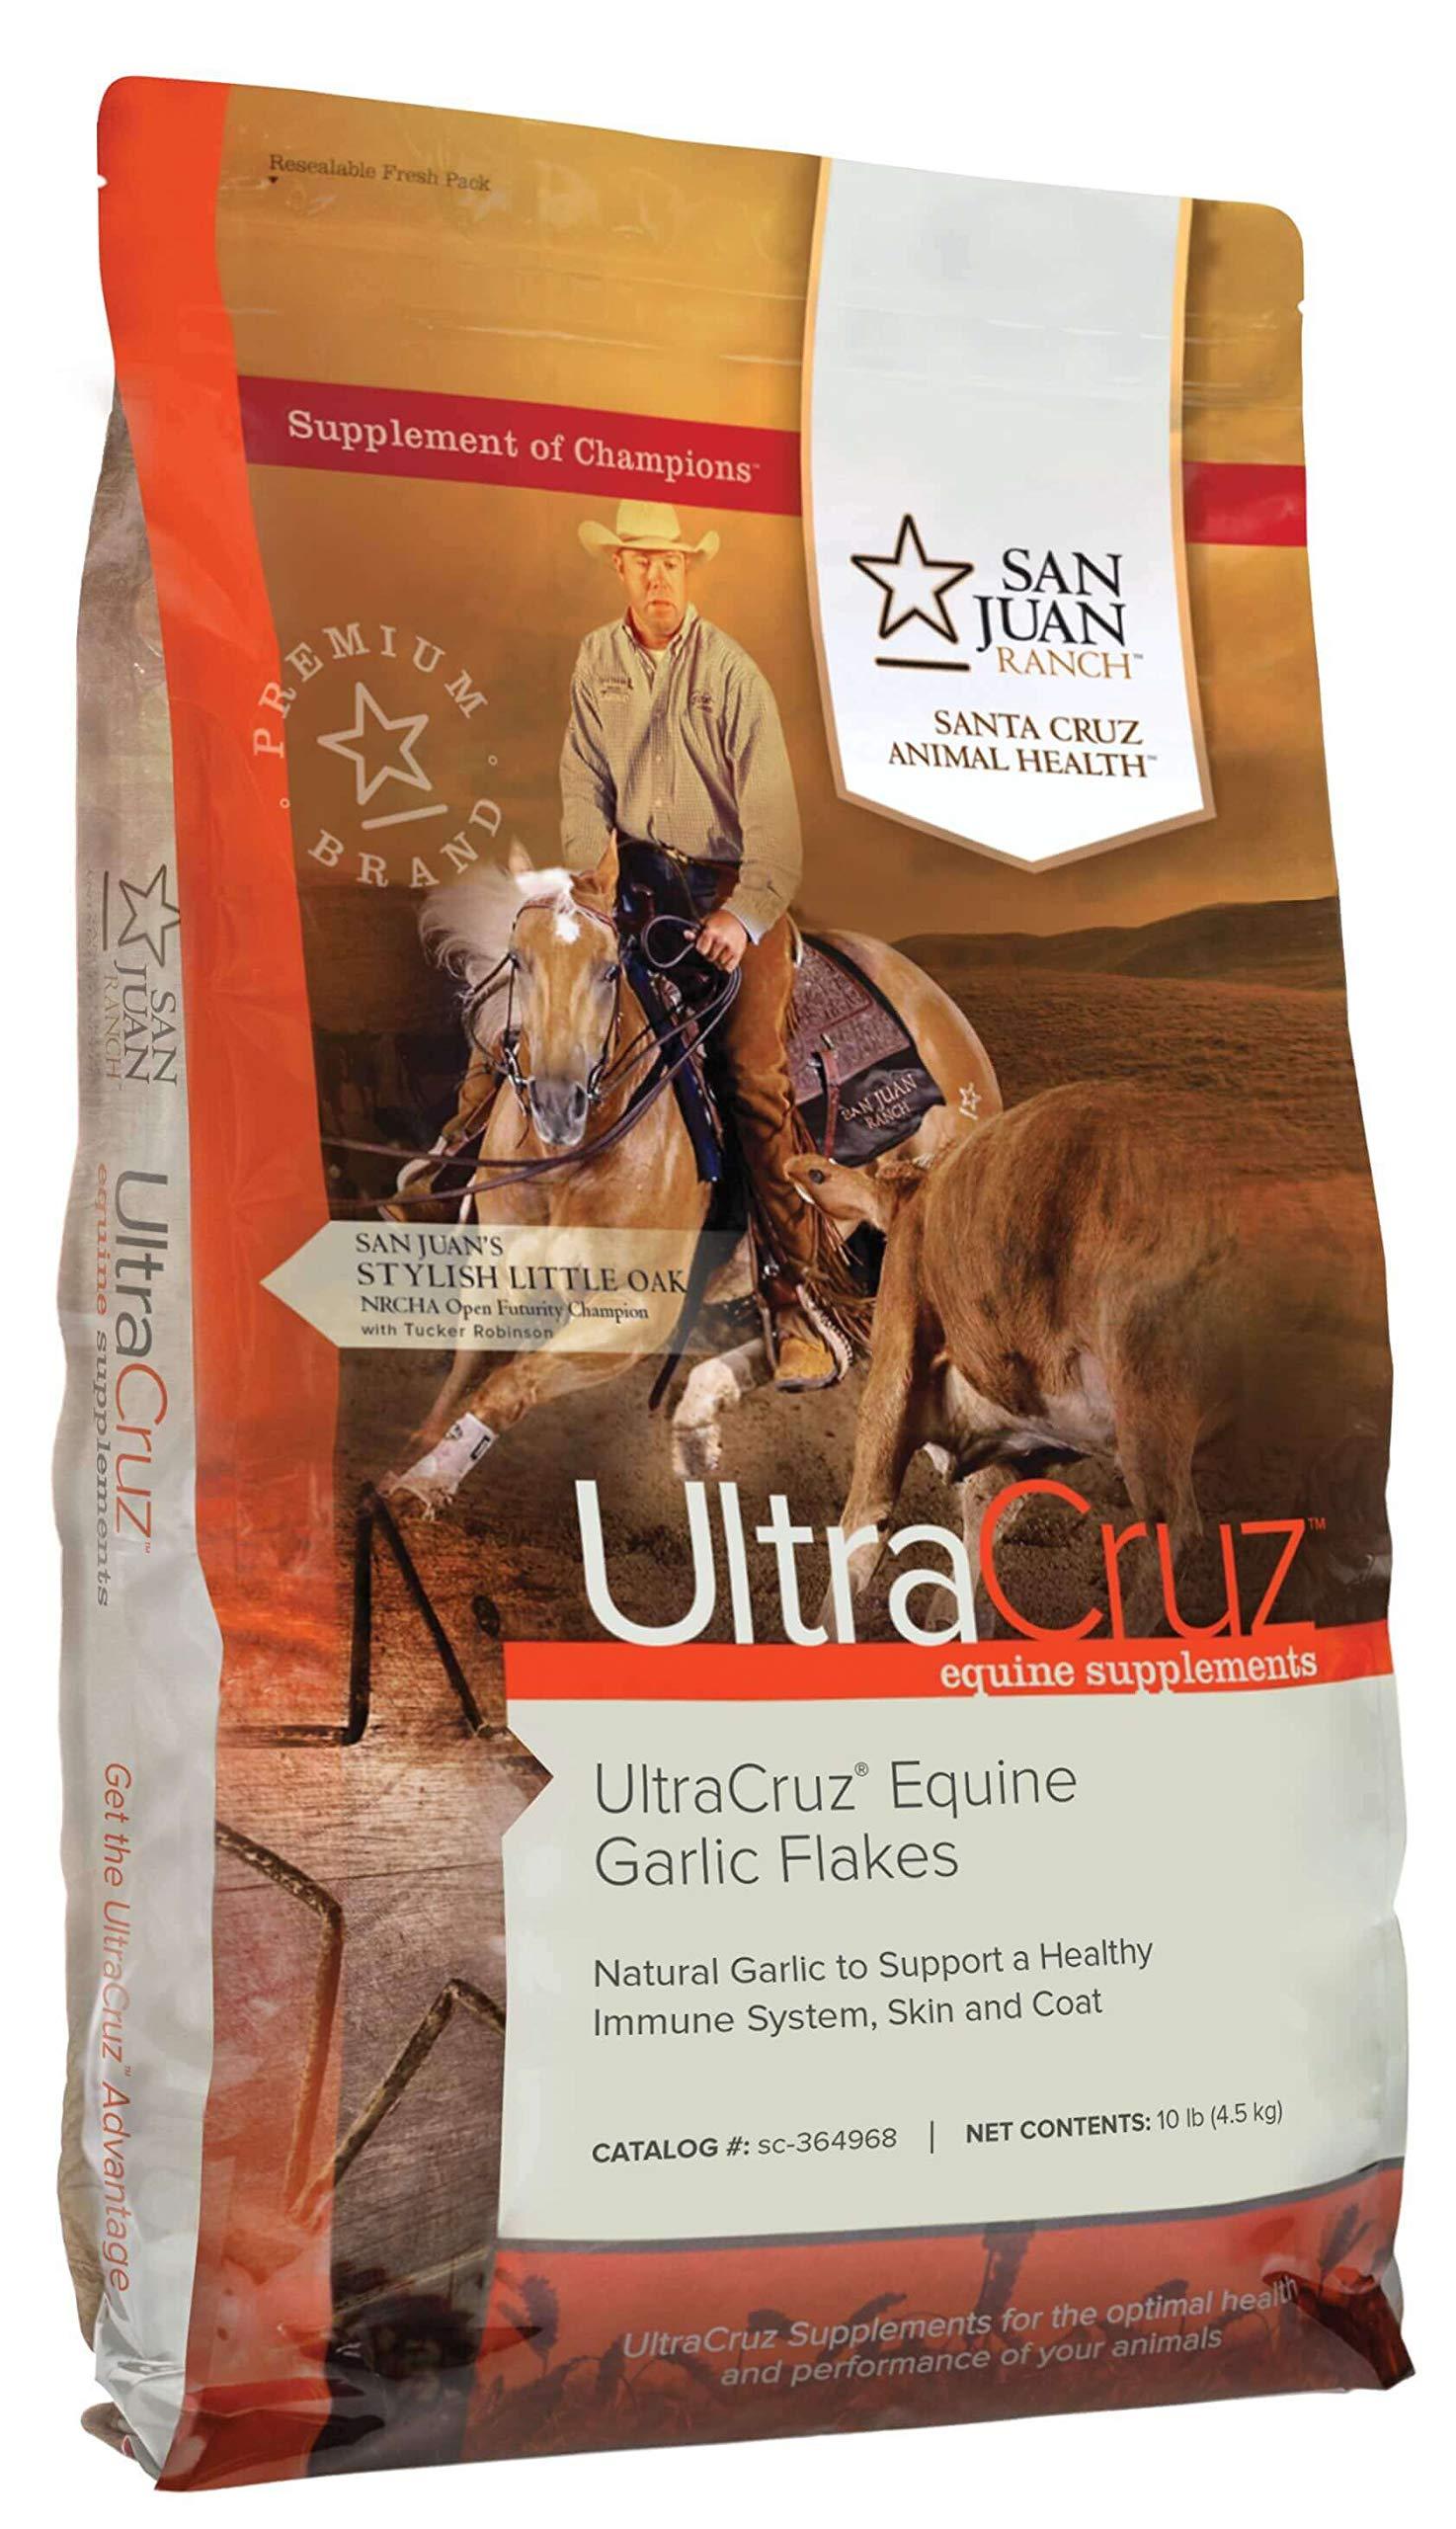 UltraCruz Equine Garlic Flakes Supplement for Horses, 10 lb (450 Day Supply) by UltraCruz